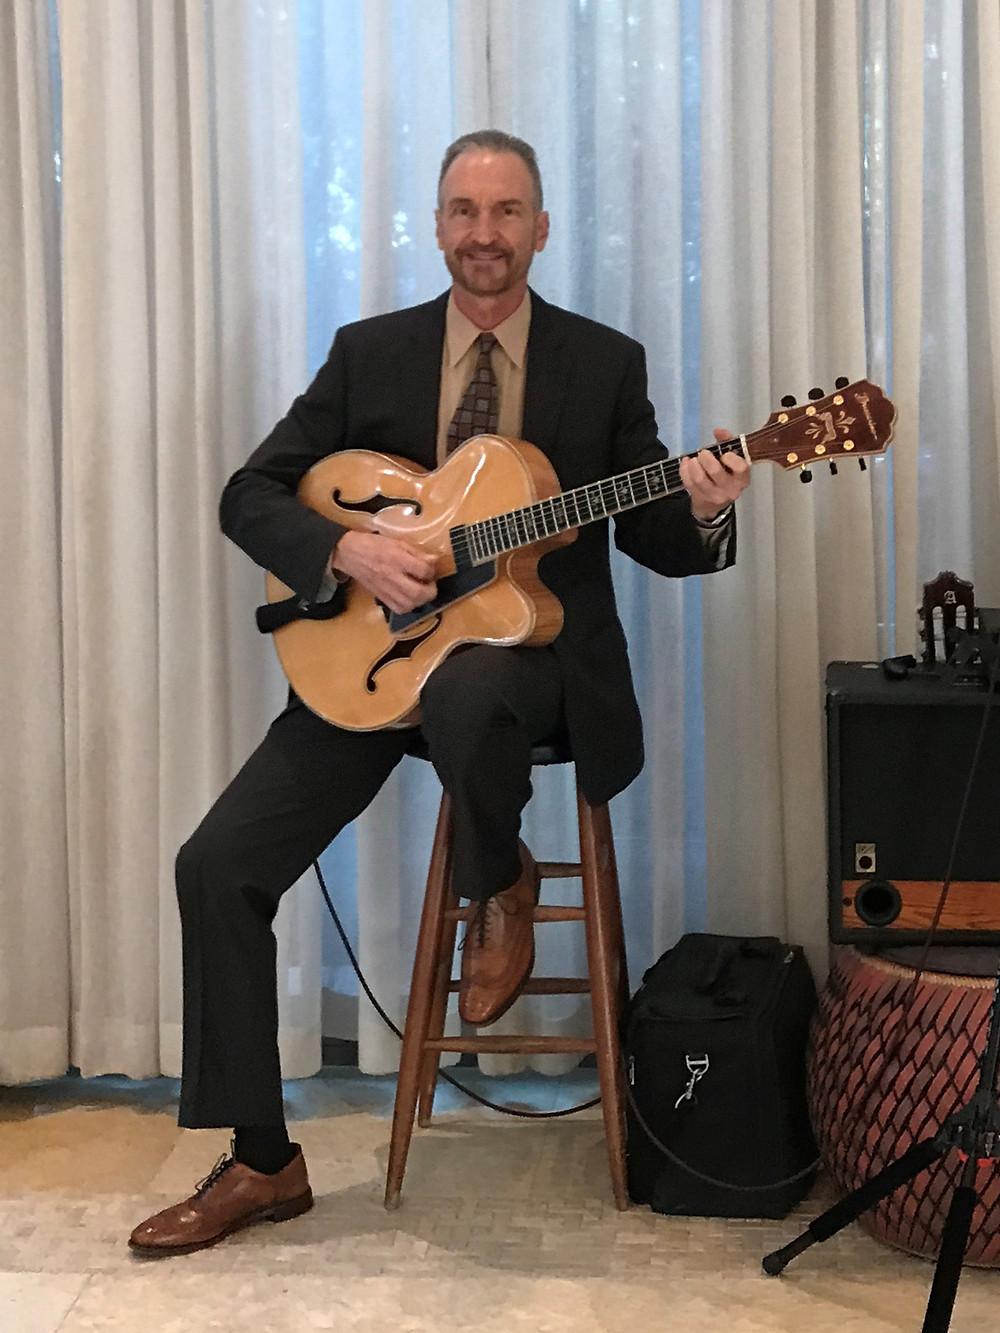 Guitarist for Dallas Planners Event